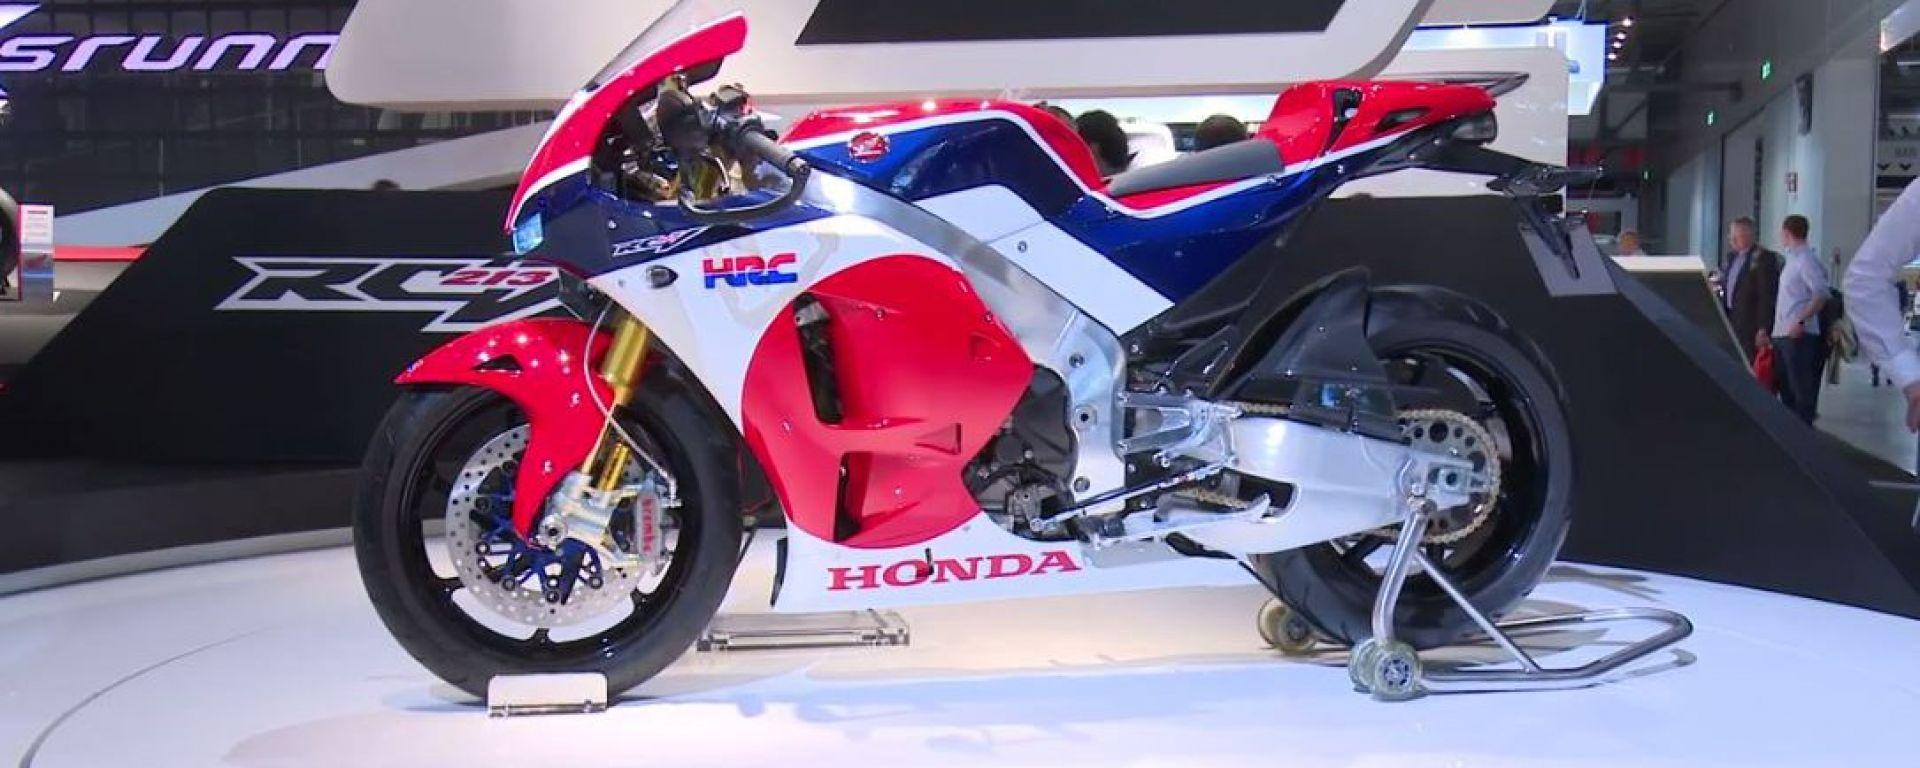 Eicma 2014, lo stand Honda